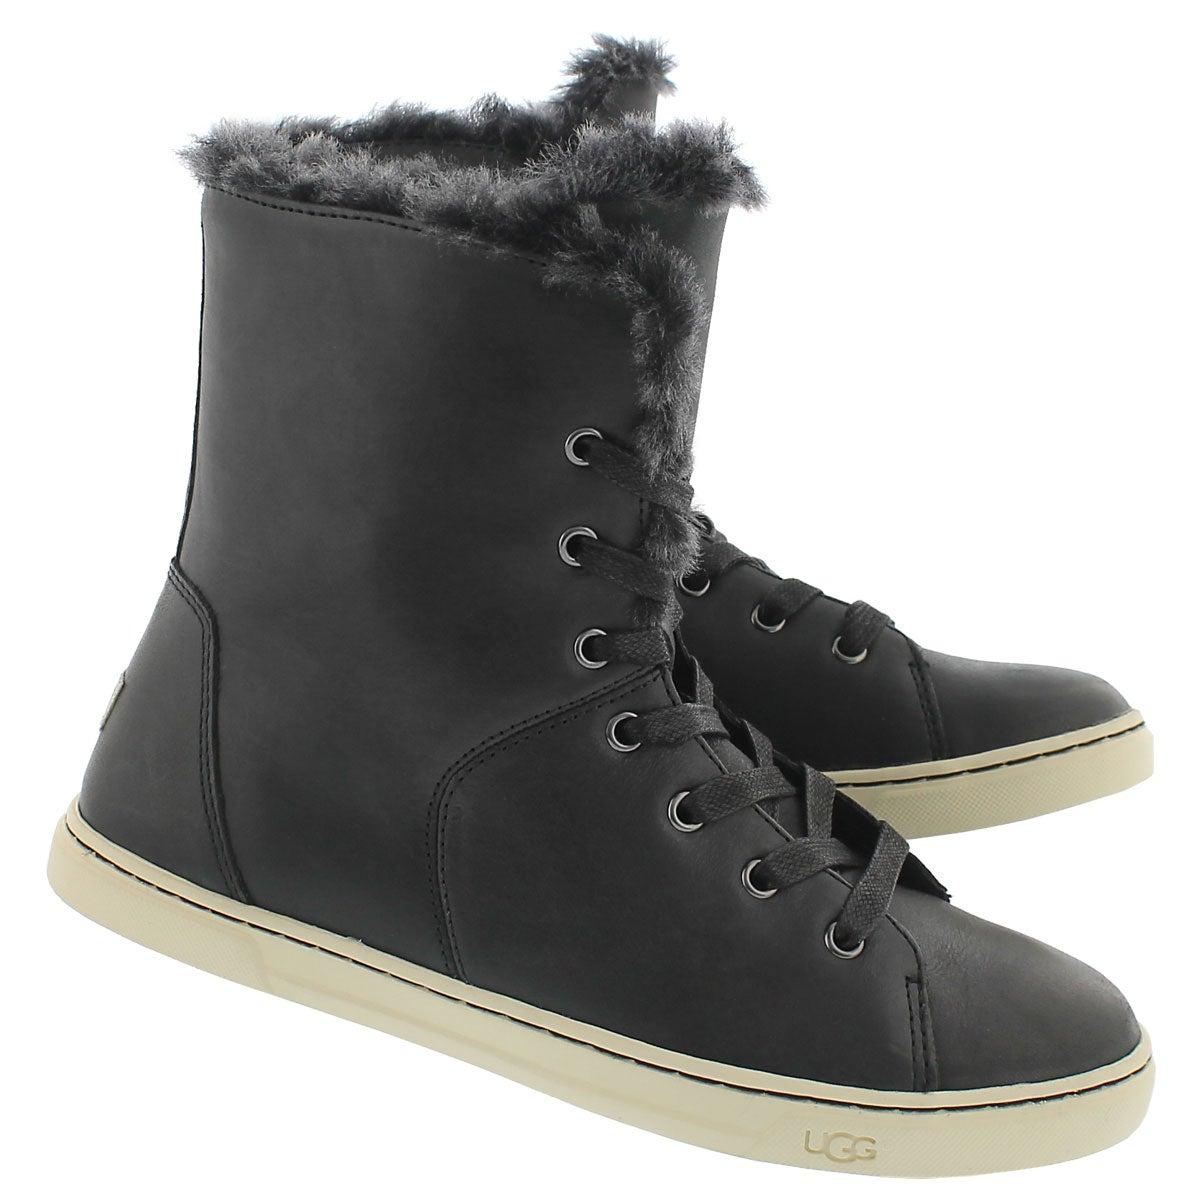 Lds Croft Luxe Quilt blk fold down boot